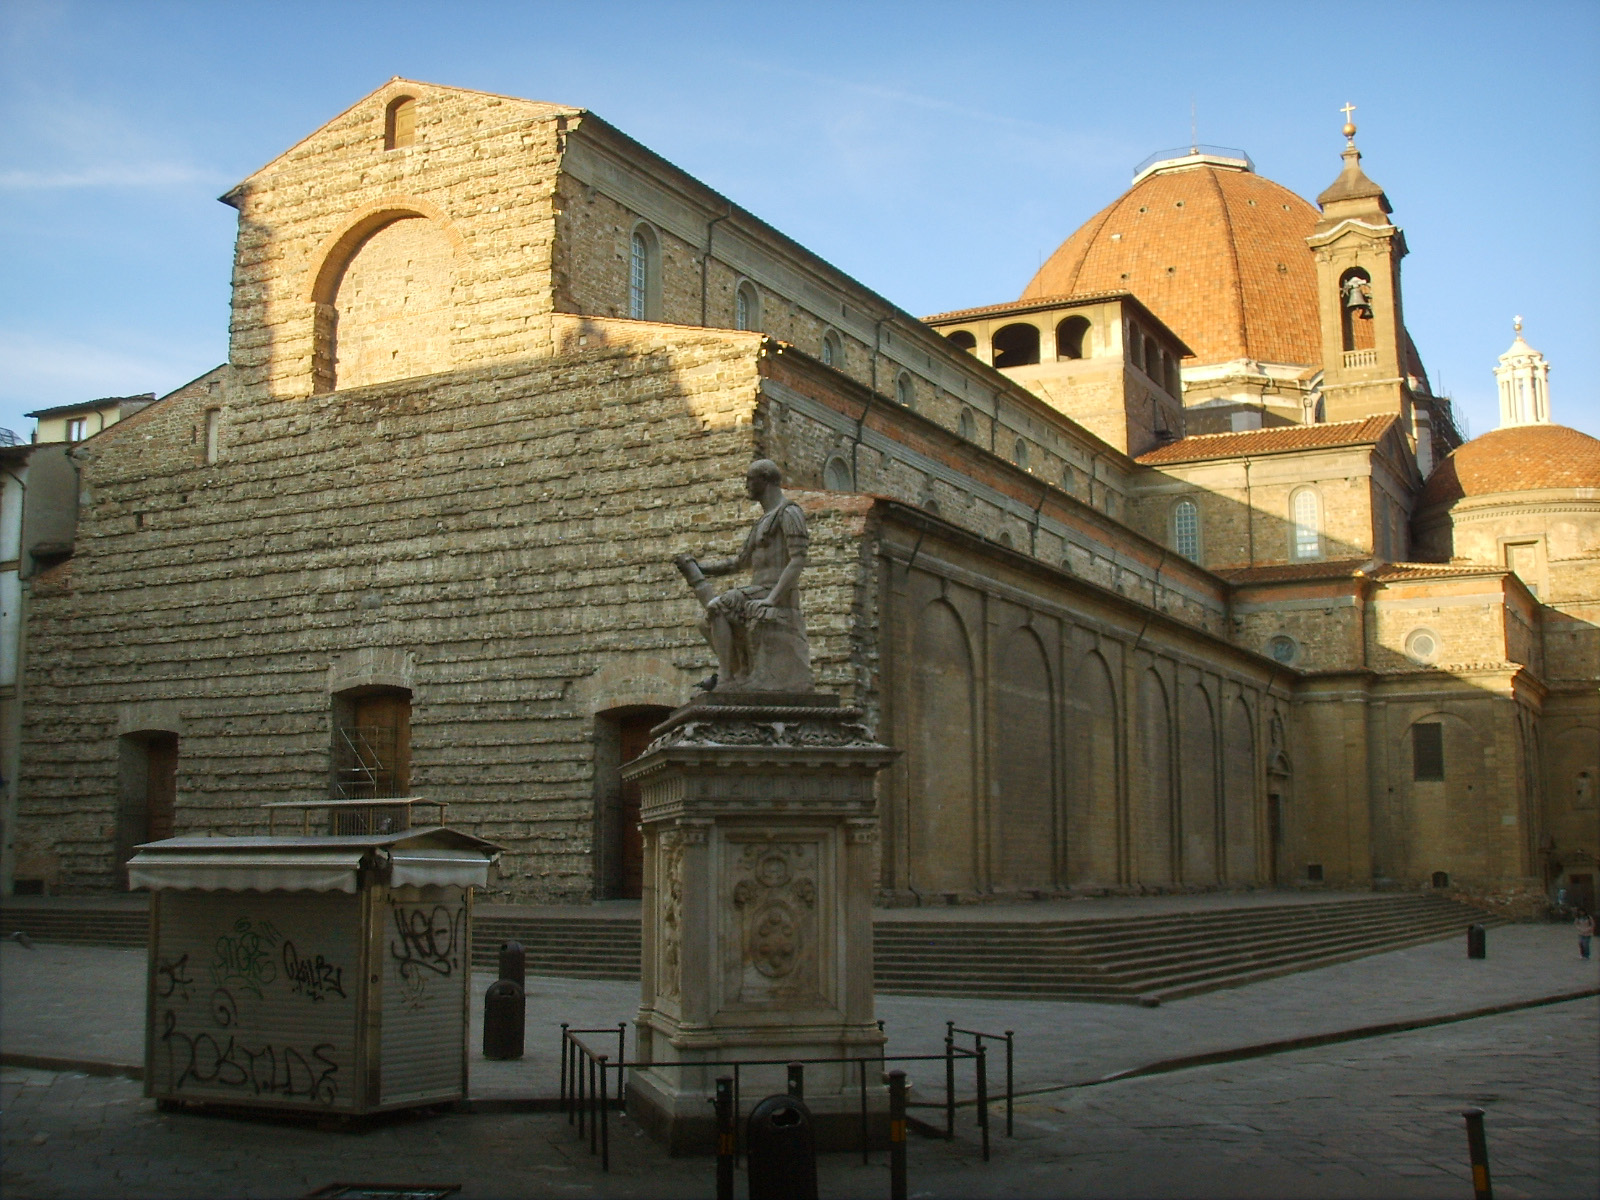 http://upload.wikimedia.org/wikipedia/commons/a/a7/Basilica_di_san_lorenzo_33.JPG